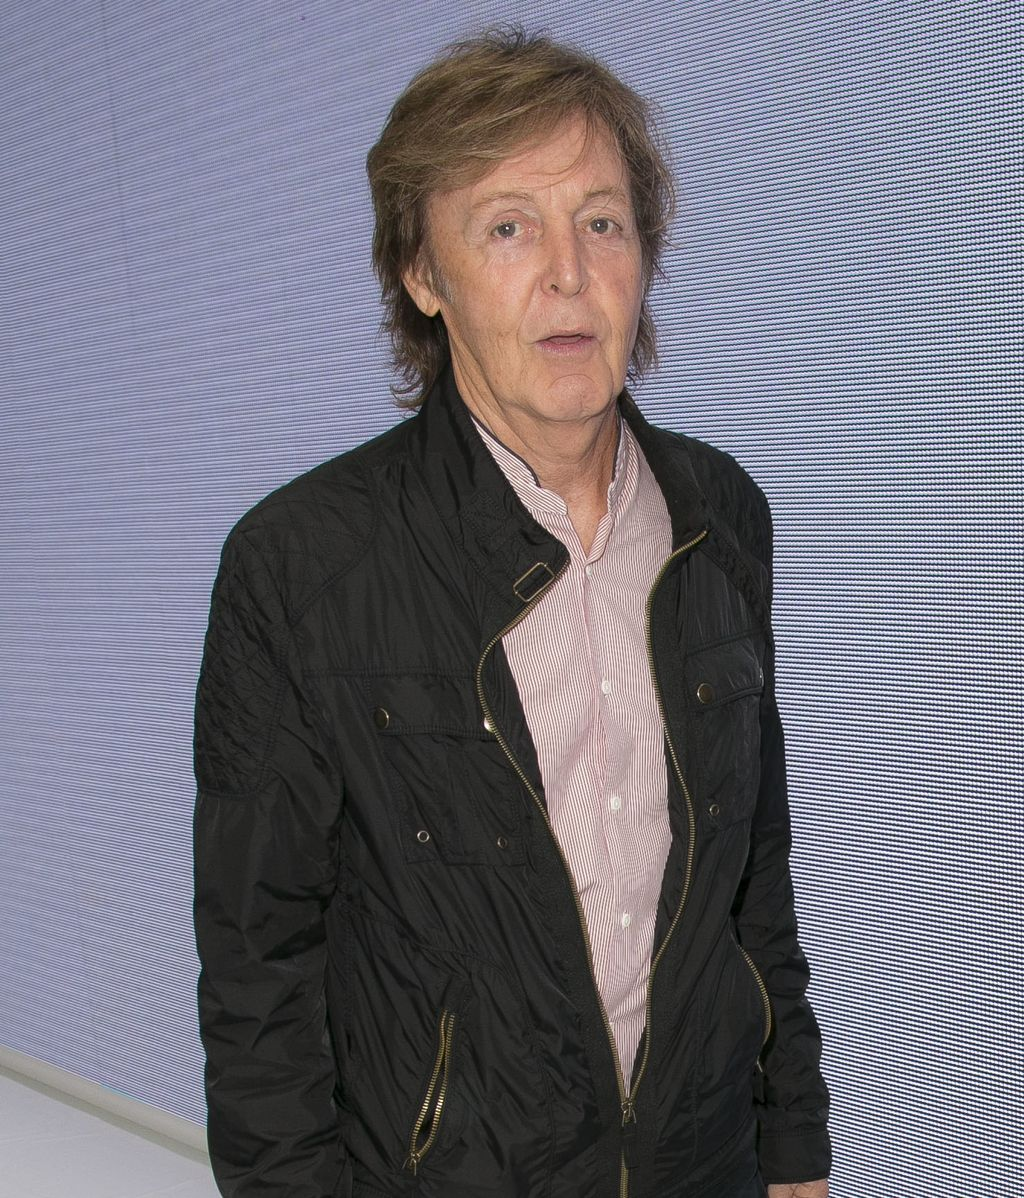 Paul McCartney, 'NO'